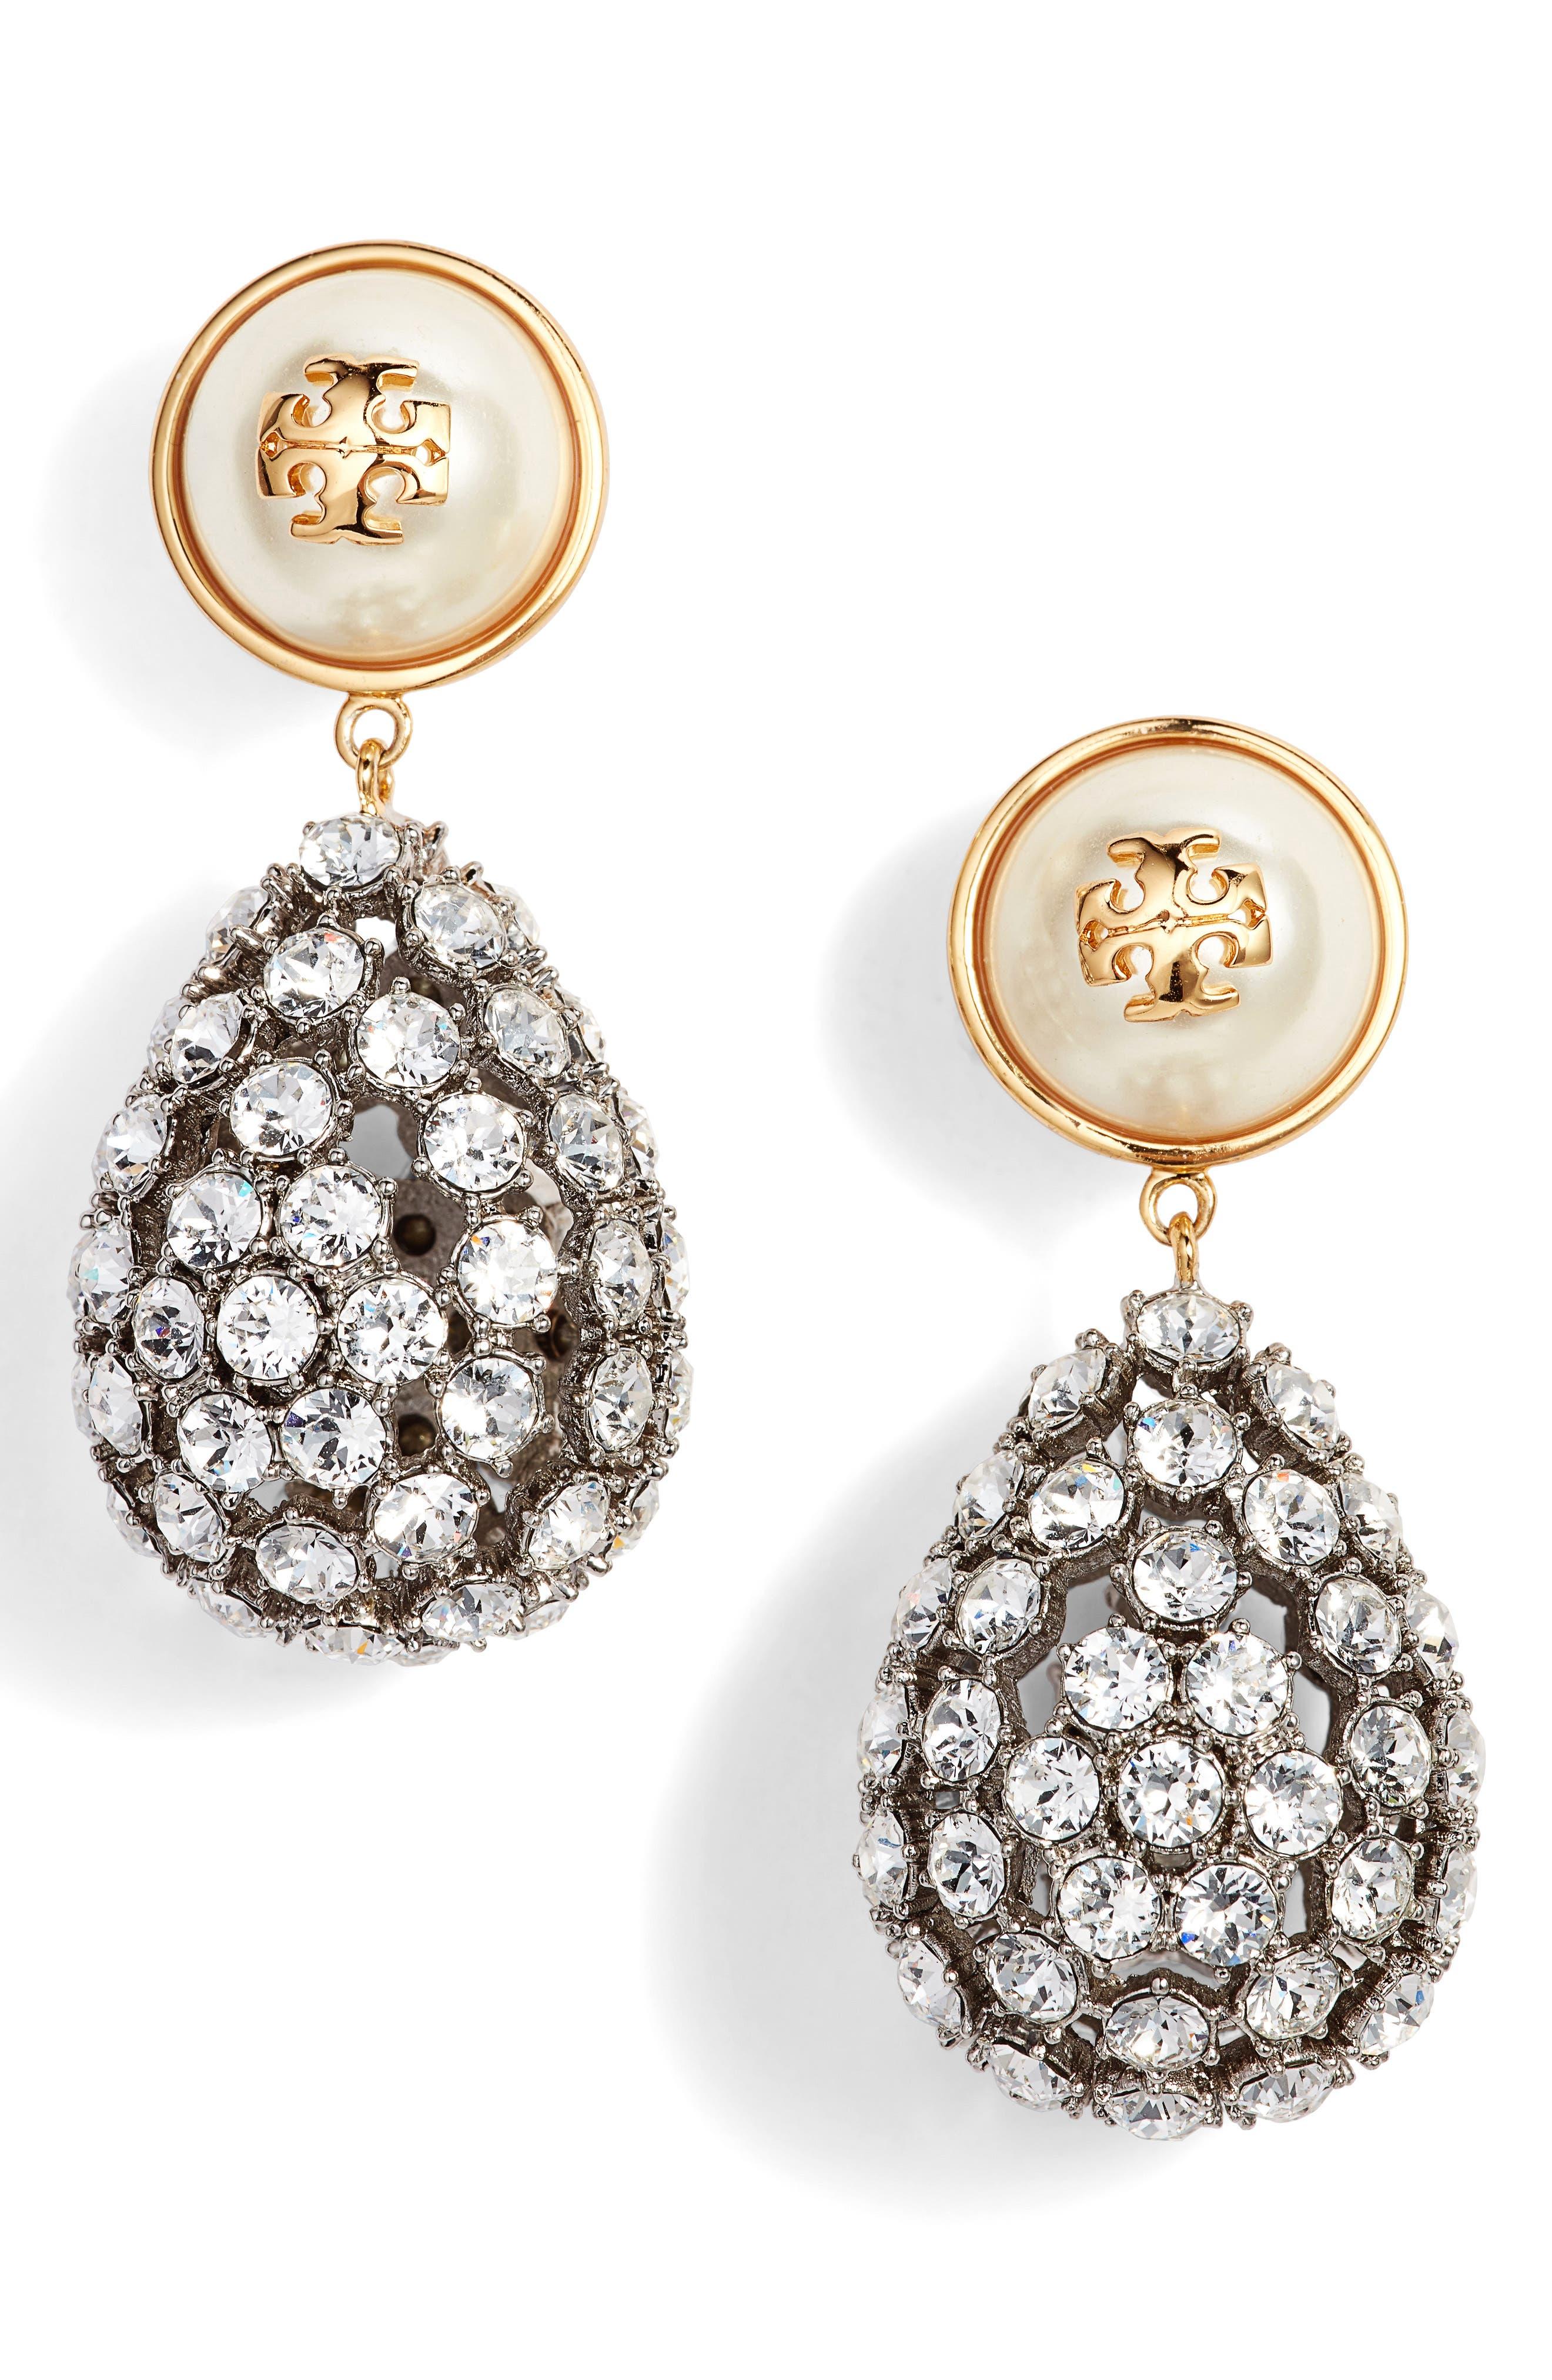 Main Image - Tory Burch Imitation Pearl Statement Drop Earrings